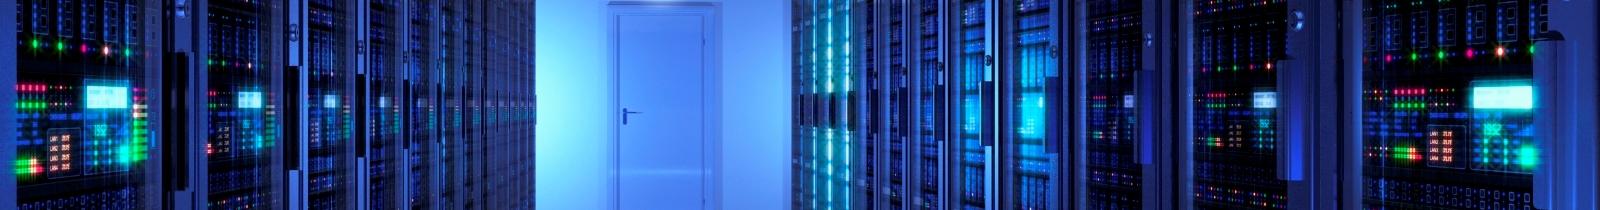 Bulk Un-terminated Fibre Cables - Universal Networks